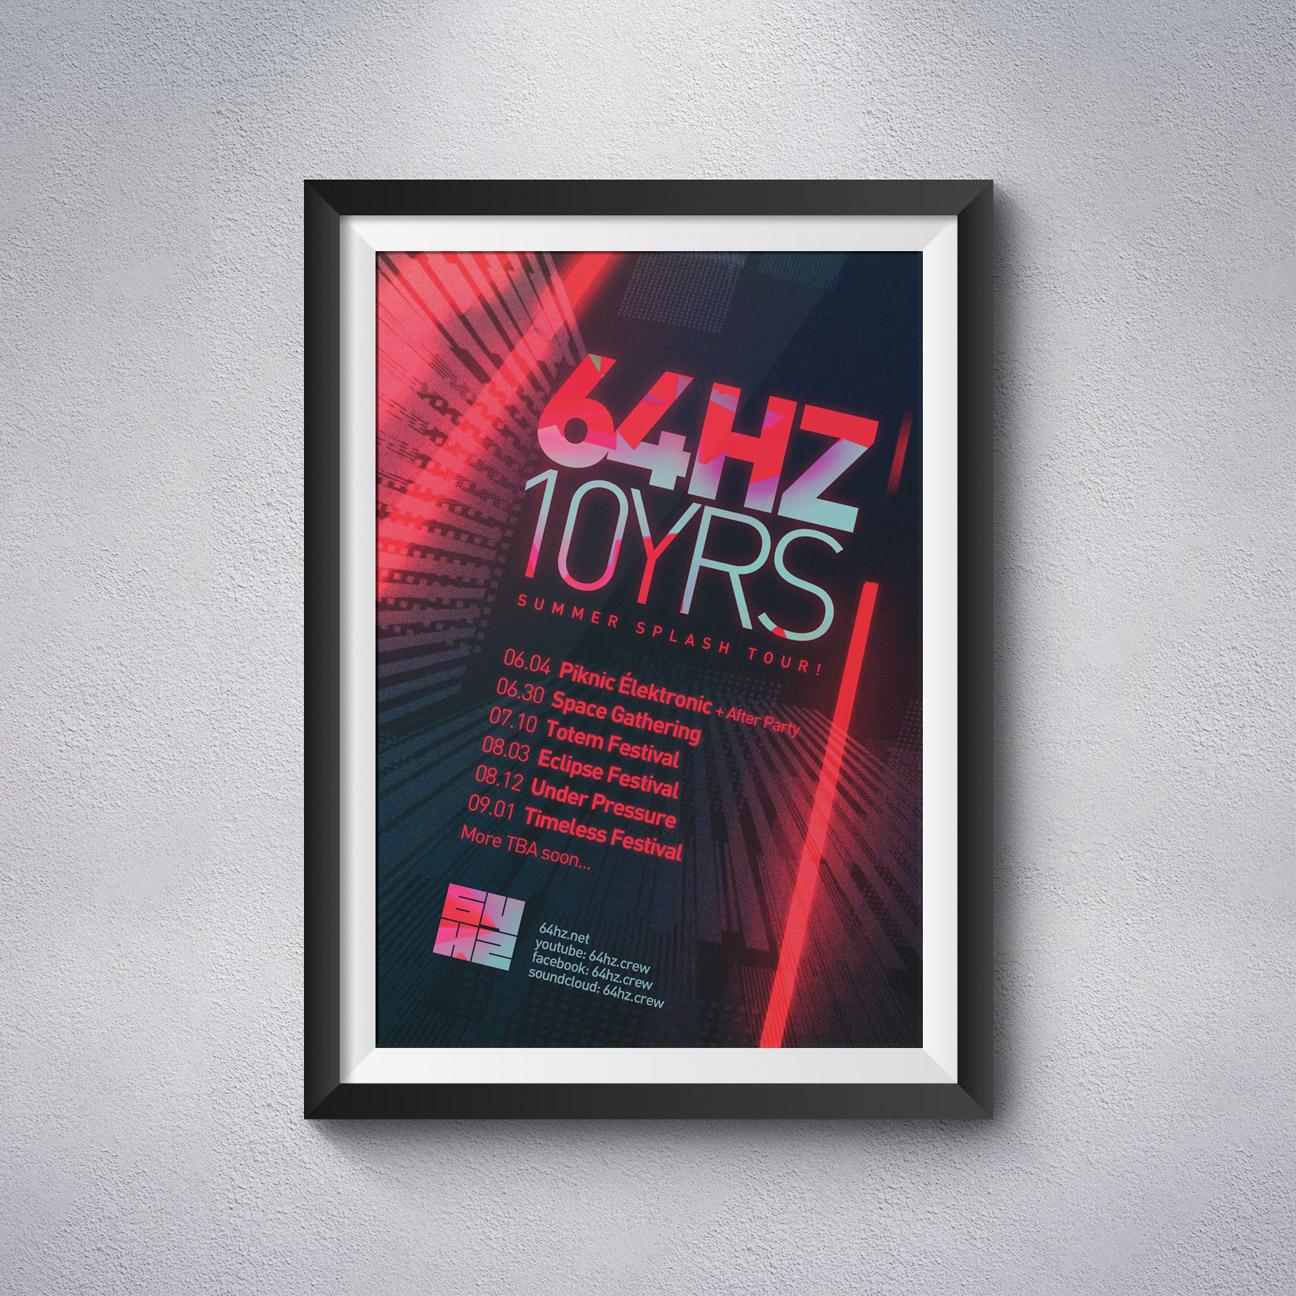 64hz-10ans-poster